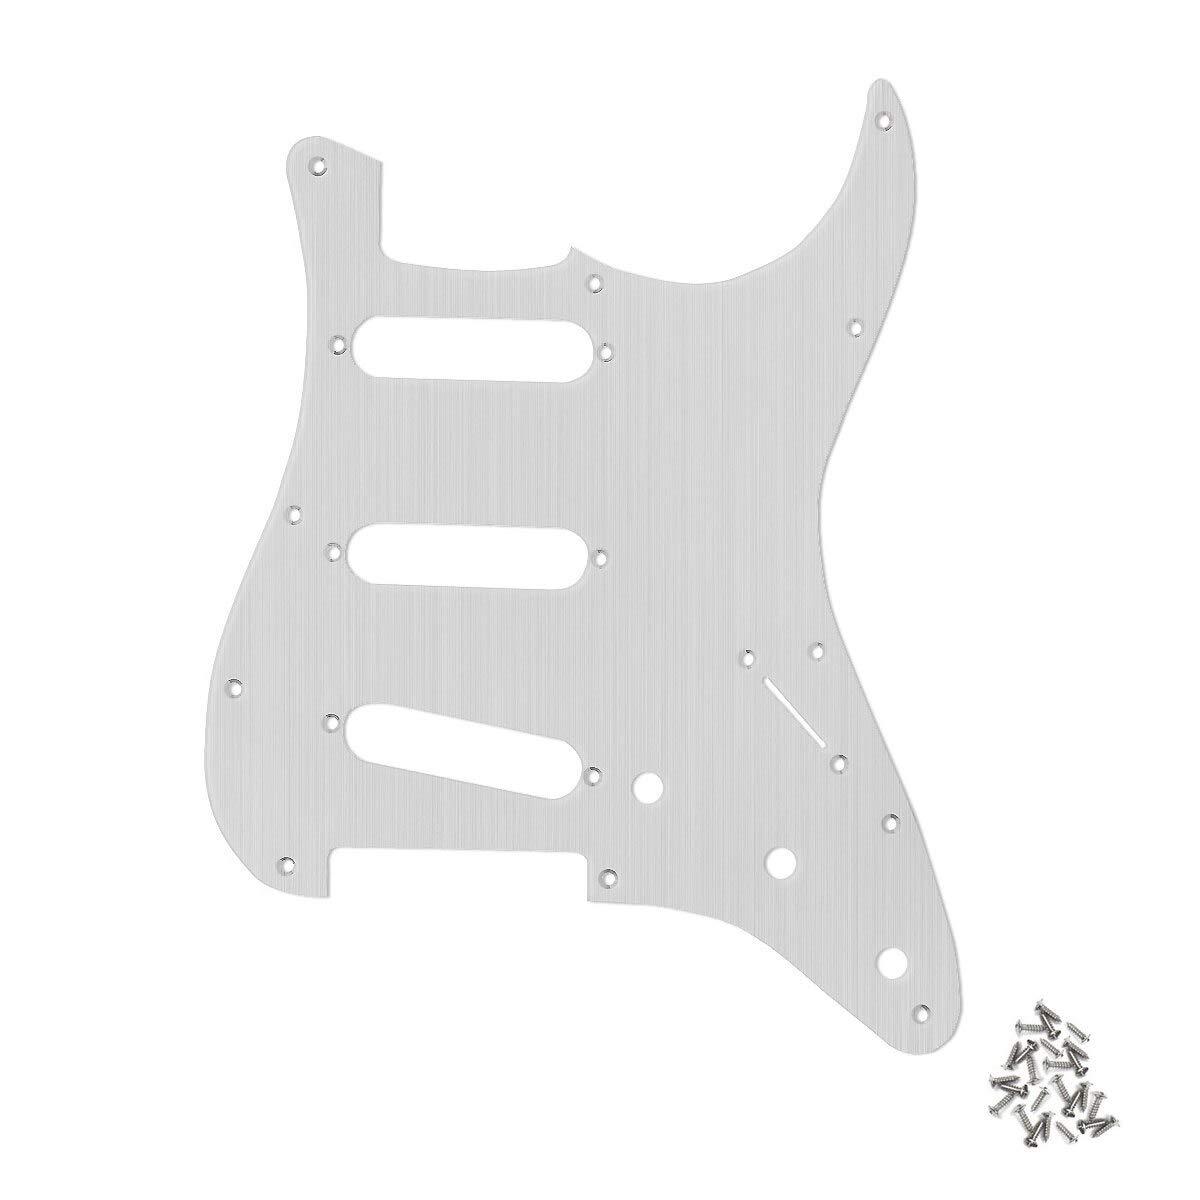 Guitar Parts for Metal Aluminum Choice Strat Pickguard SSS Selling rankings Gui Electric